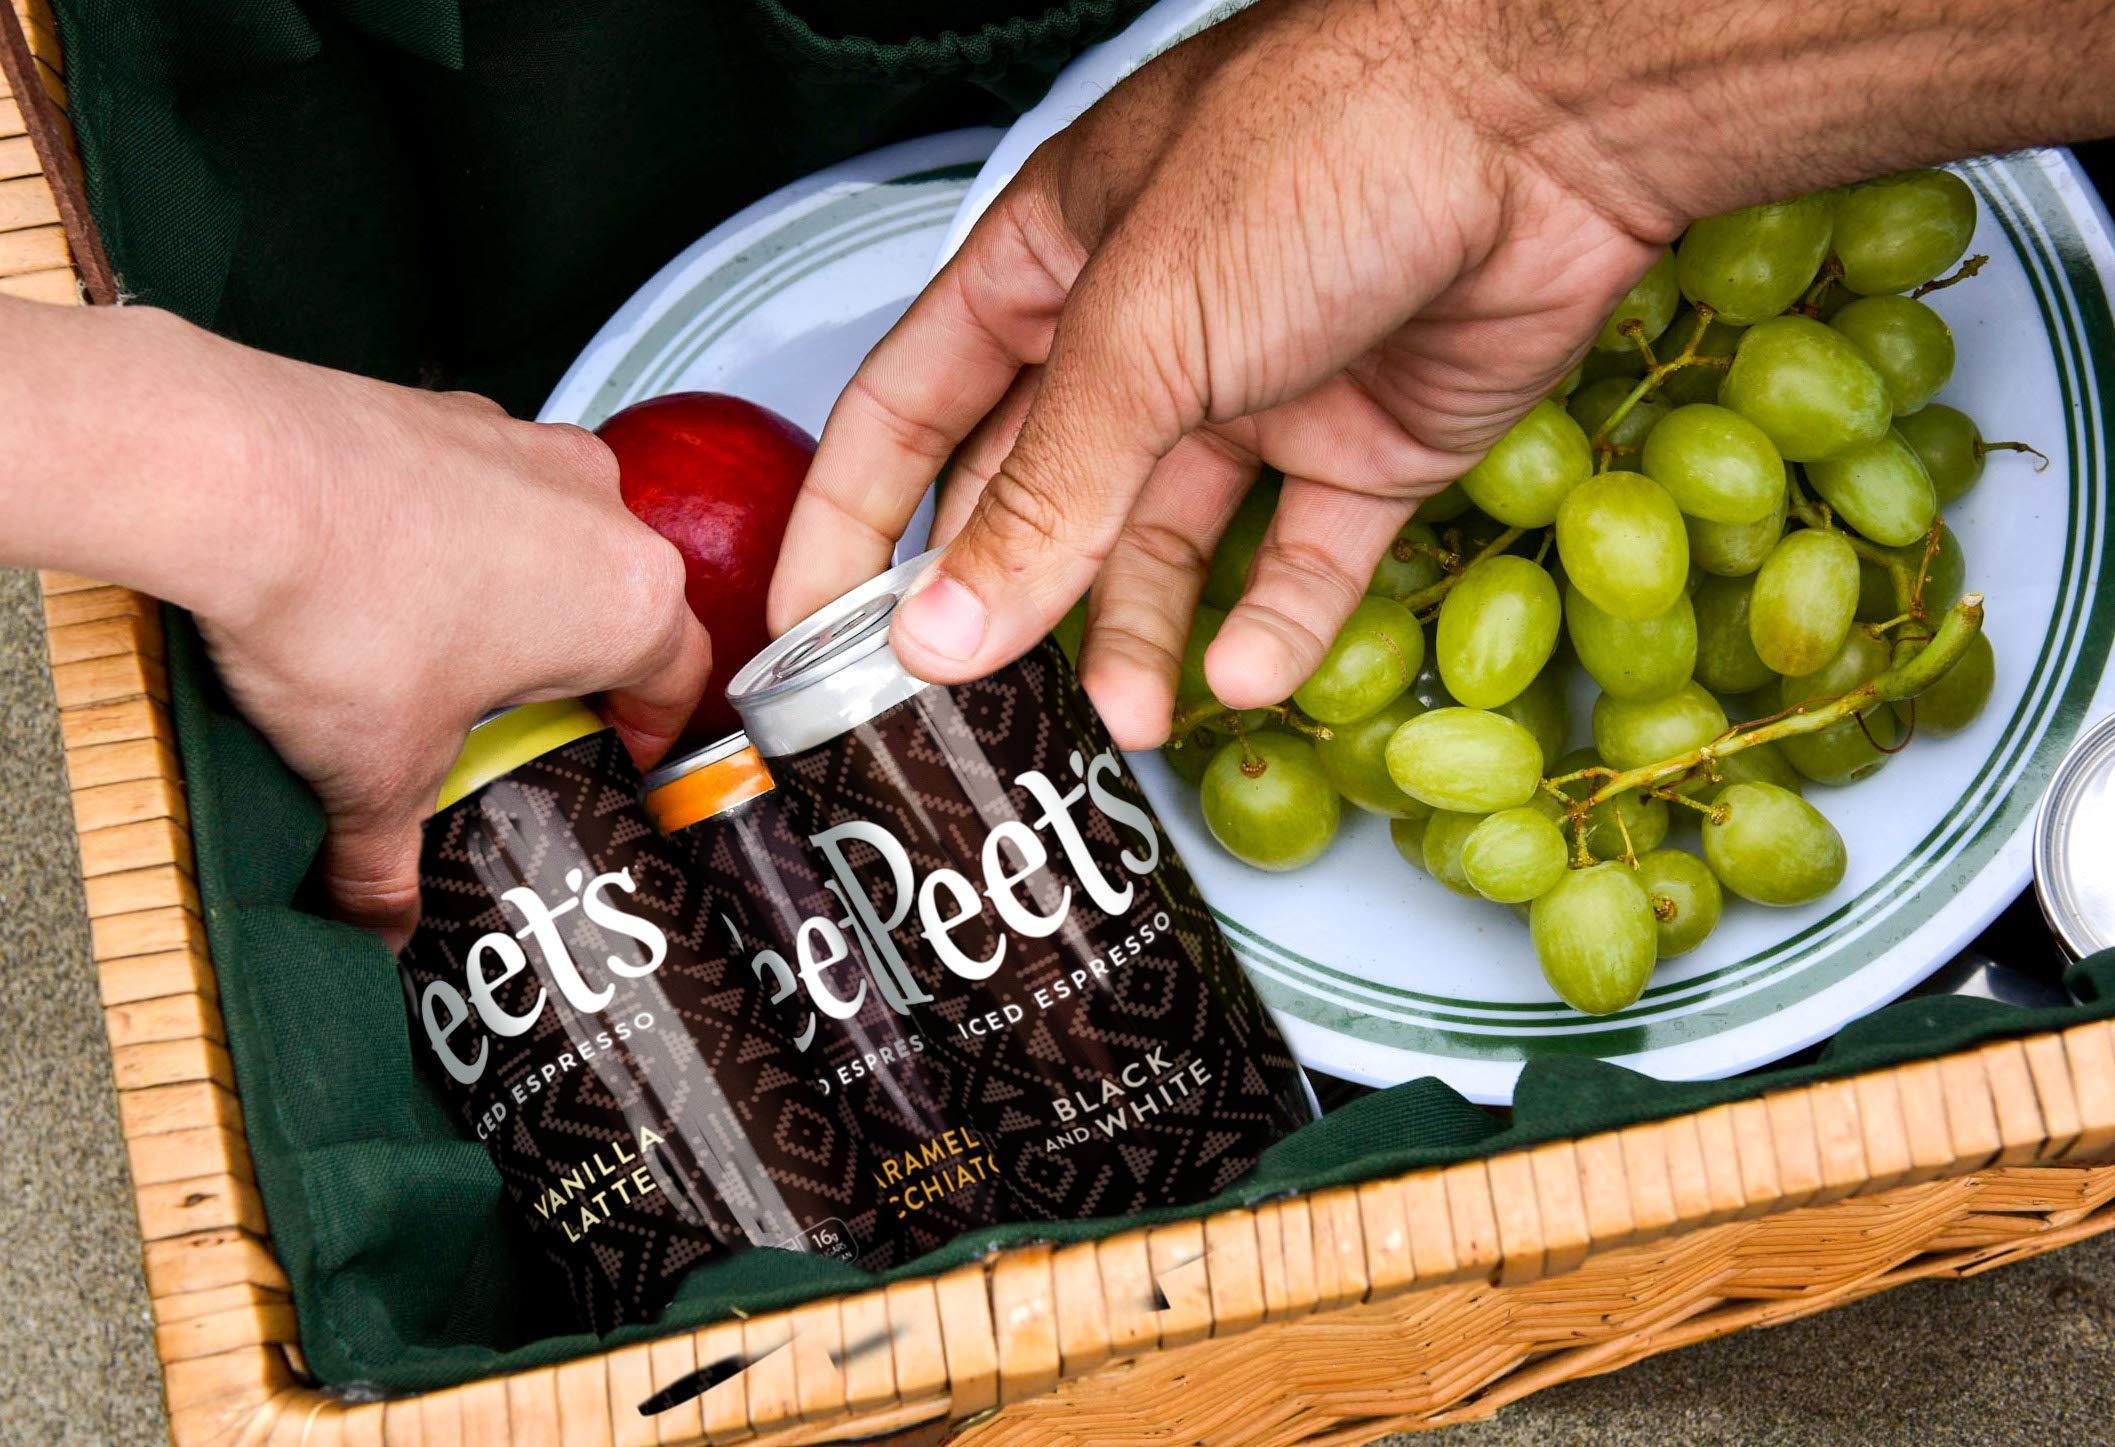 Peet's Iced Espresso Mocha Chocolate 8 oz Can (12 Count) Single-Origin Colombian Espresso with Dutch Process Cocoa & Milk 110 Calorie 17 grams of sugar by Peet's Coffee (Image #6)